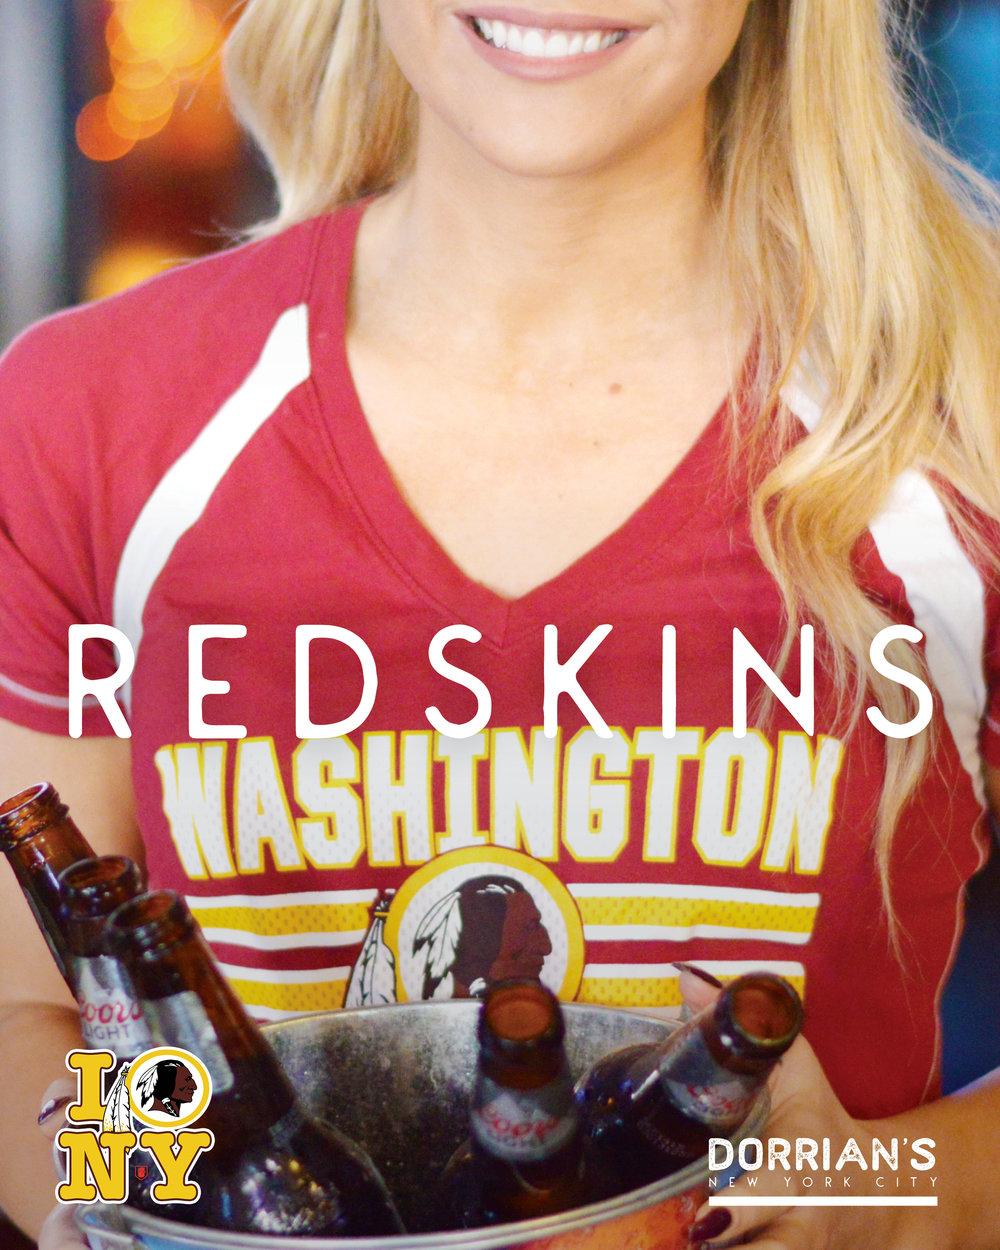 drh_nyc-2018-insta-redskins-two-girls-regulars-4.jpg